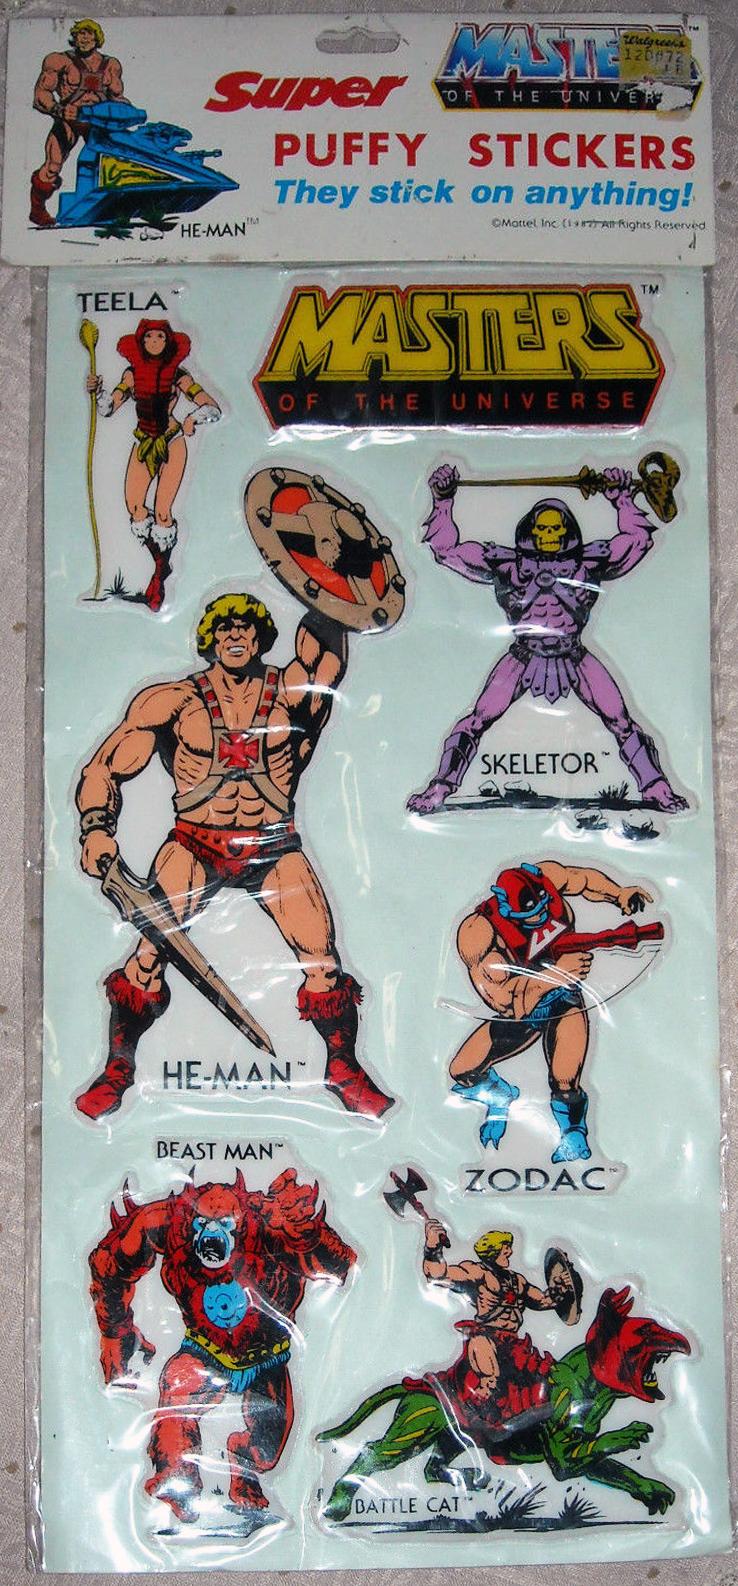 he-man org  u0026gt  merchandising  u0026gt  stickers and albums  u0026gt  gordy  super puffy stickers